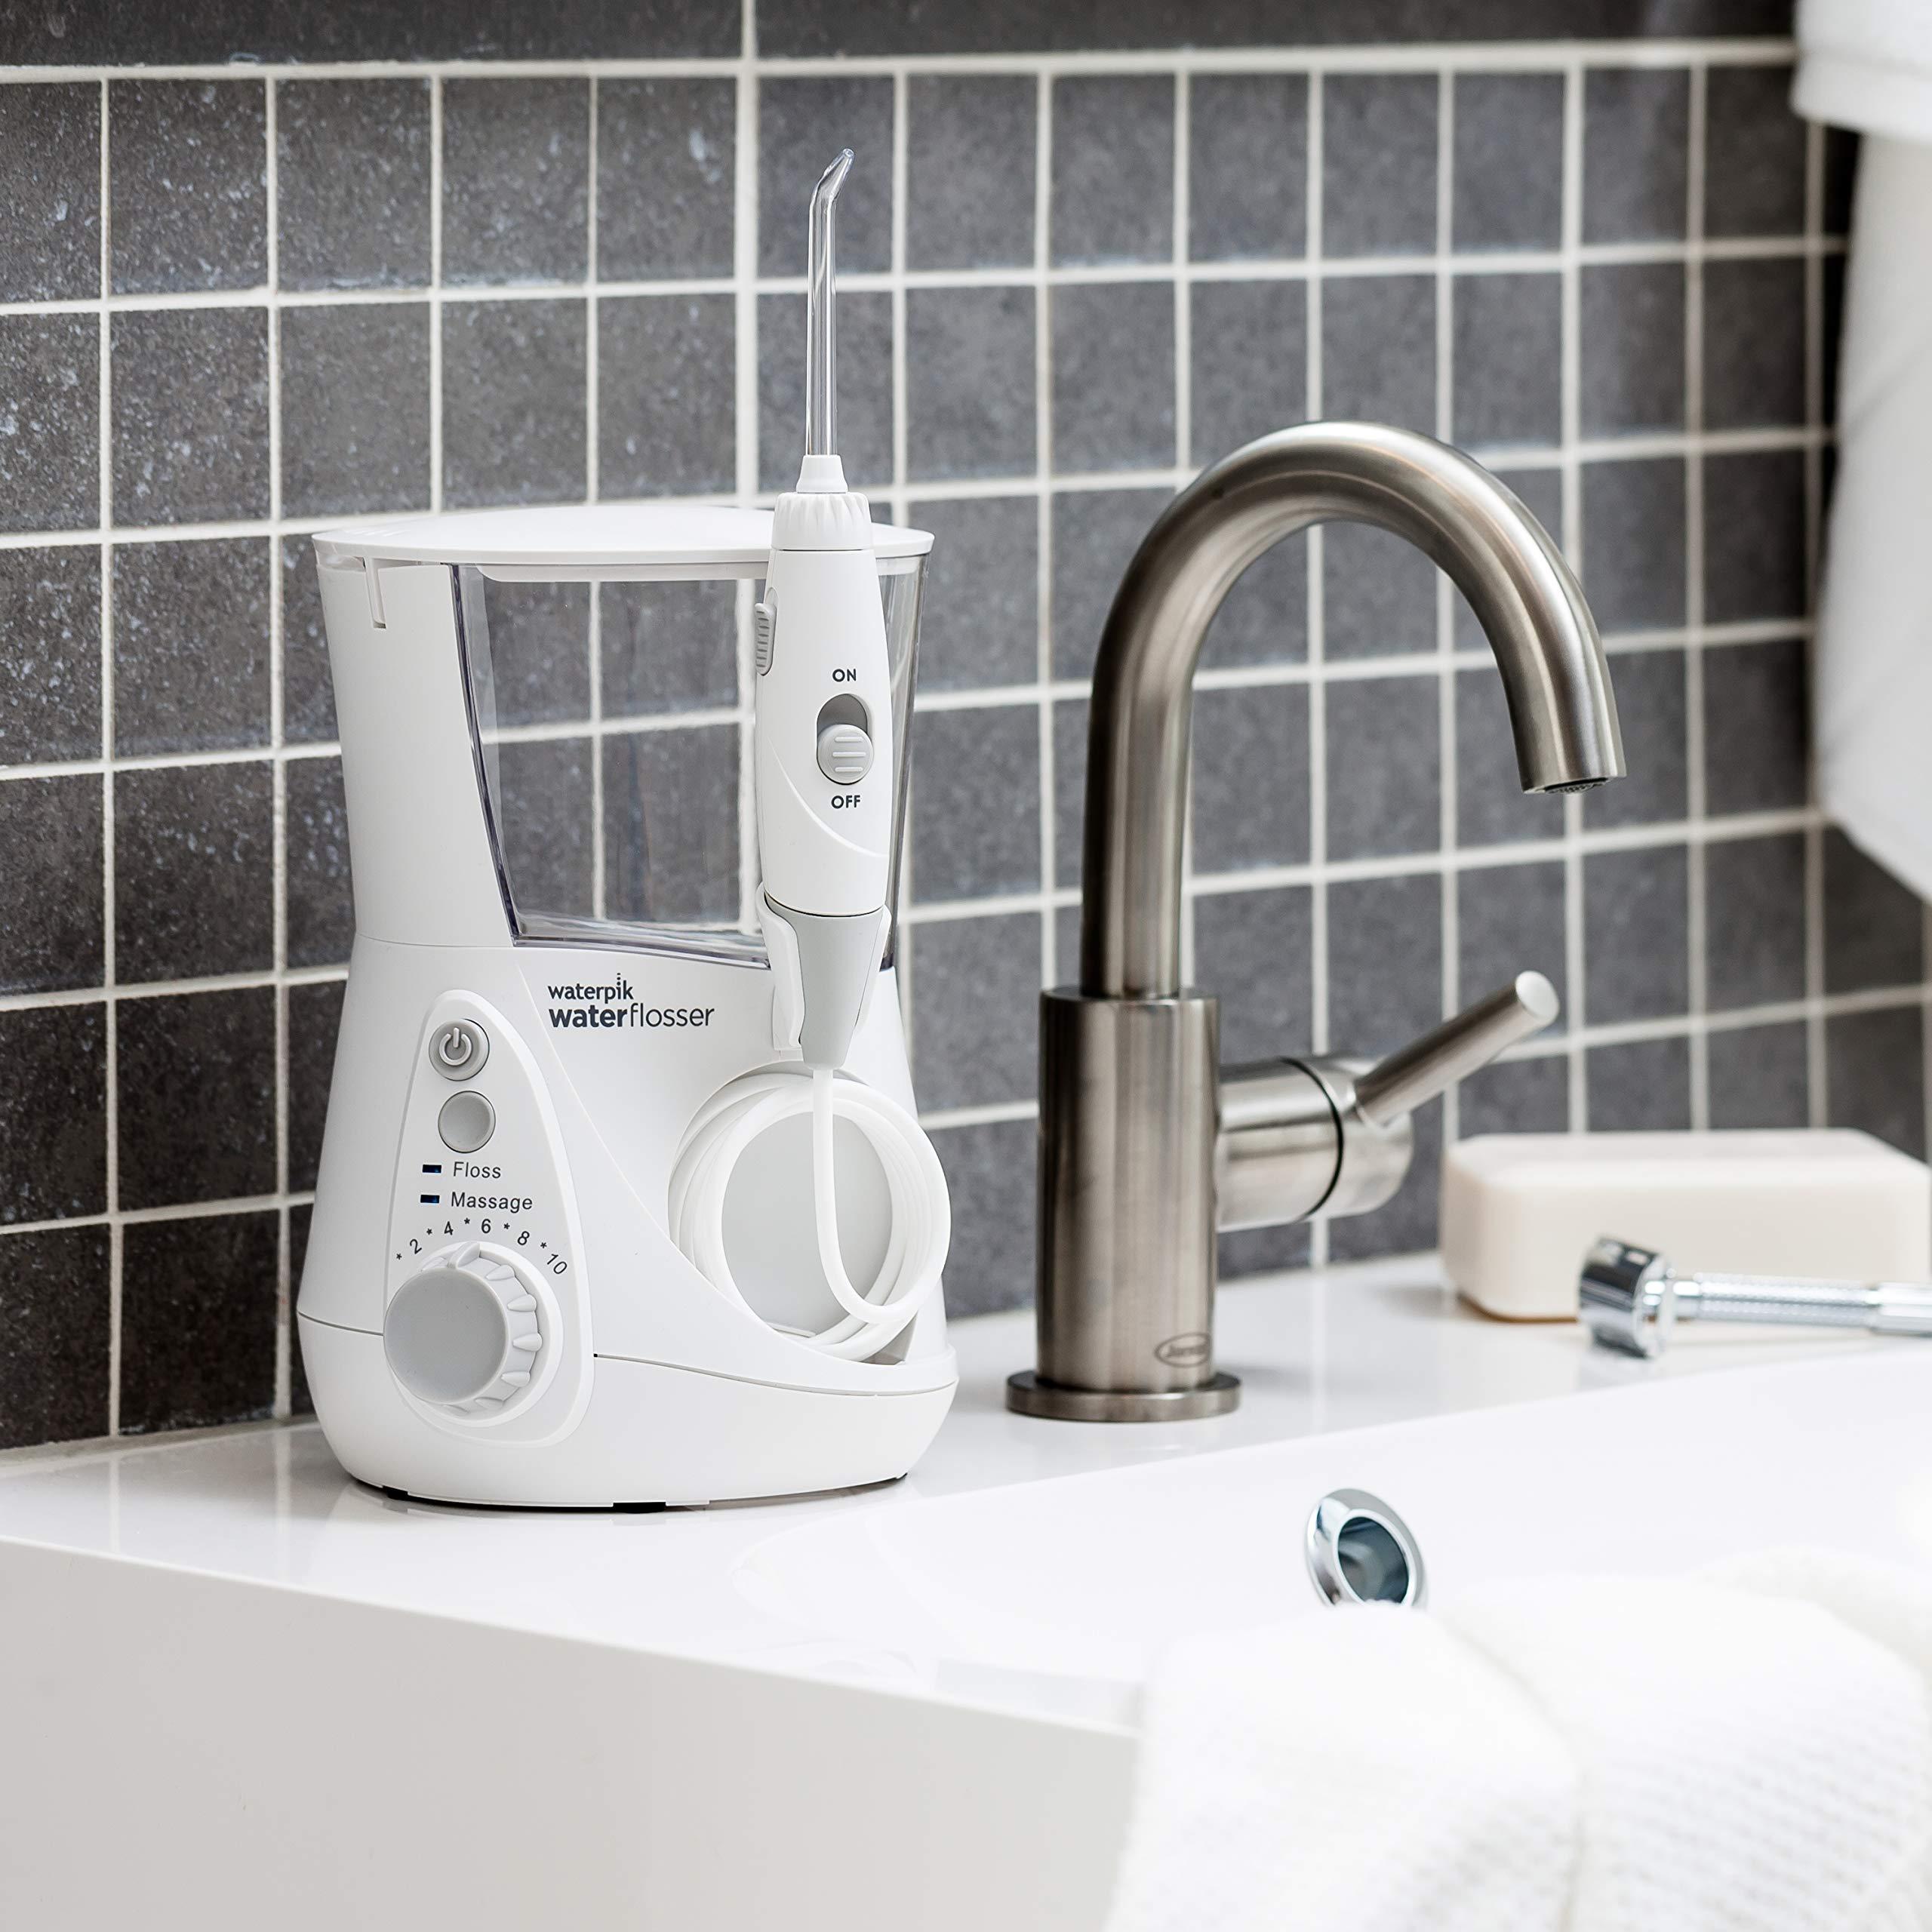 Waterpik Water Flosser Electric Dental Countertop Oral Irrigator For Teeth – Aquarius Professional, WP-660 White by Waterpik (Image #11)